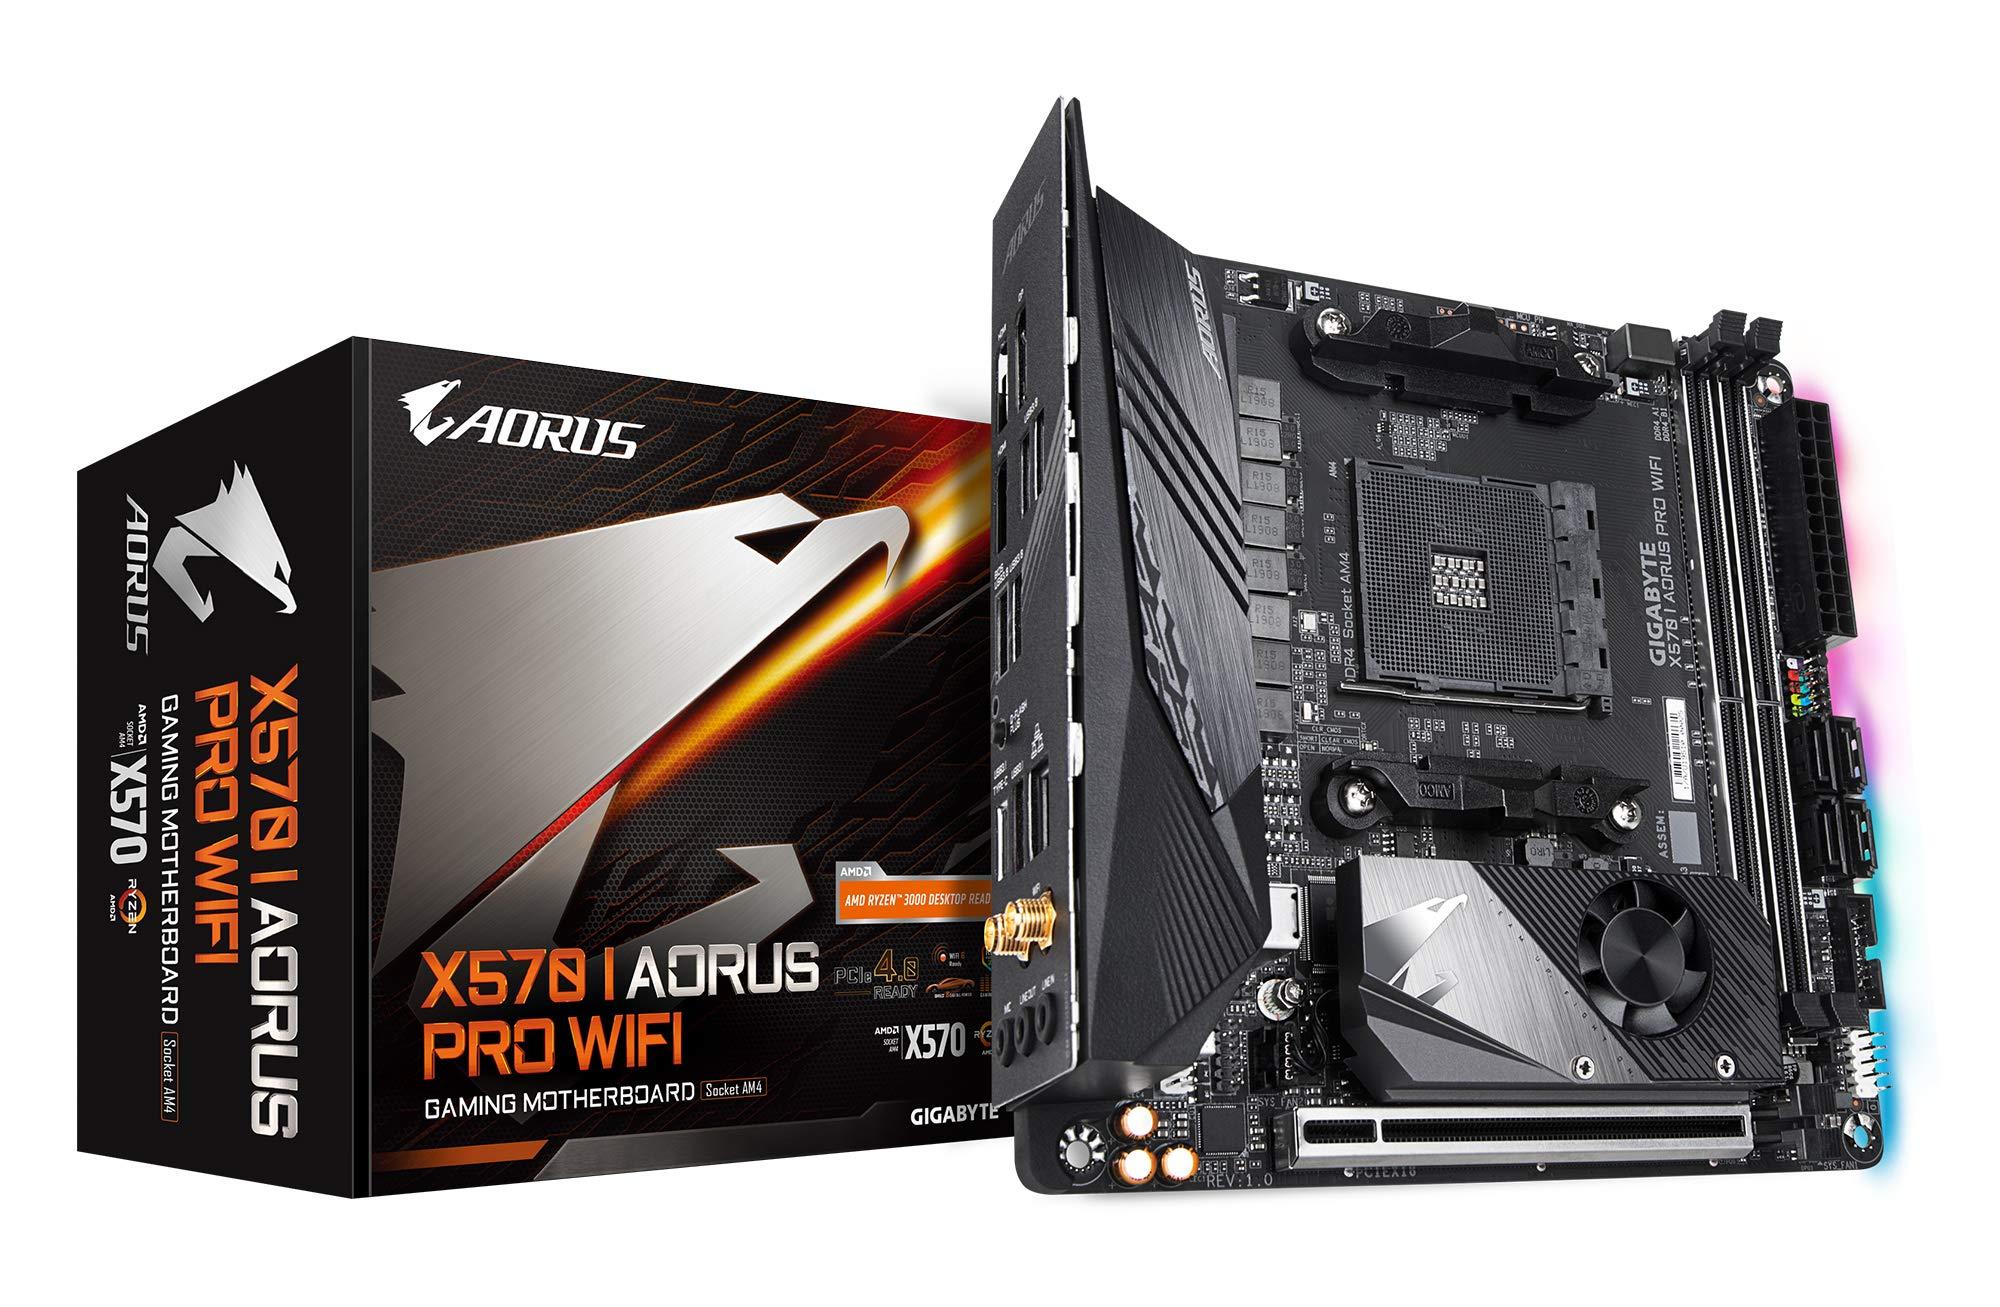 Gigabyte X570 I AORUS Pro WiFi (AMD Ryzen 3000/X570/Mini-Itx/PCIe4.0/DDR4/USB 3.1/Realtek ALC1220-Vb/DisplayPort 1.4/2xHDMI 2.0B/RGB Fusion 2.0/Gaming Motherboard) by Gigabyte